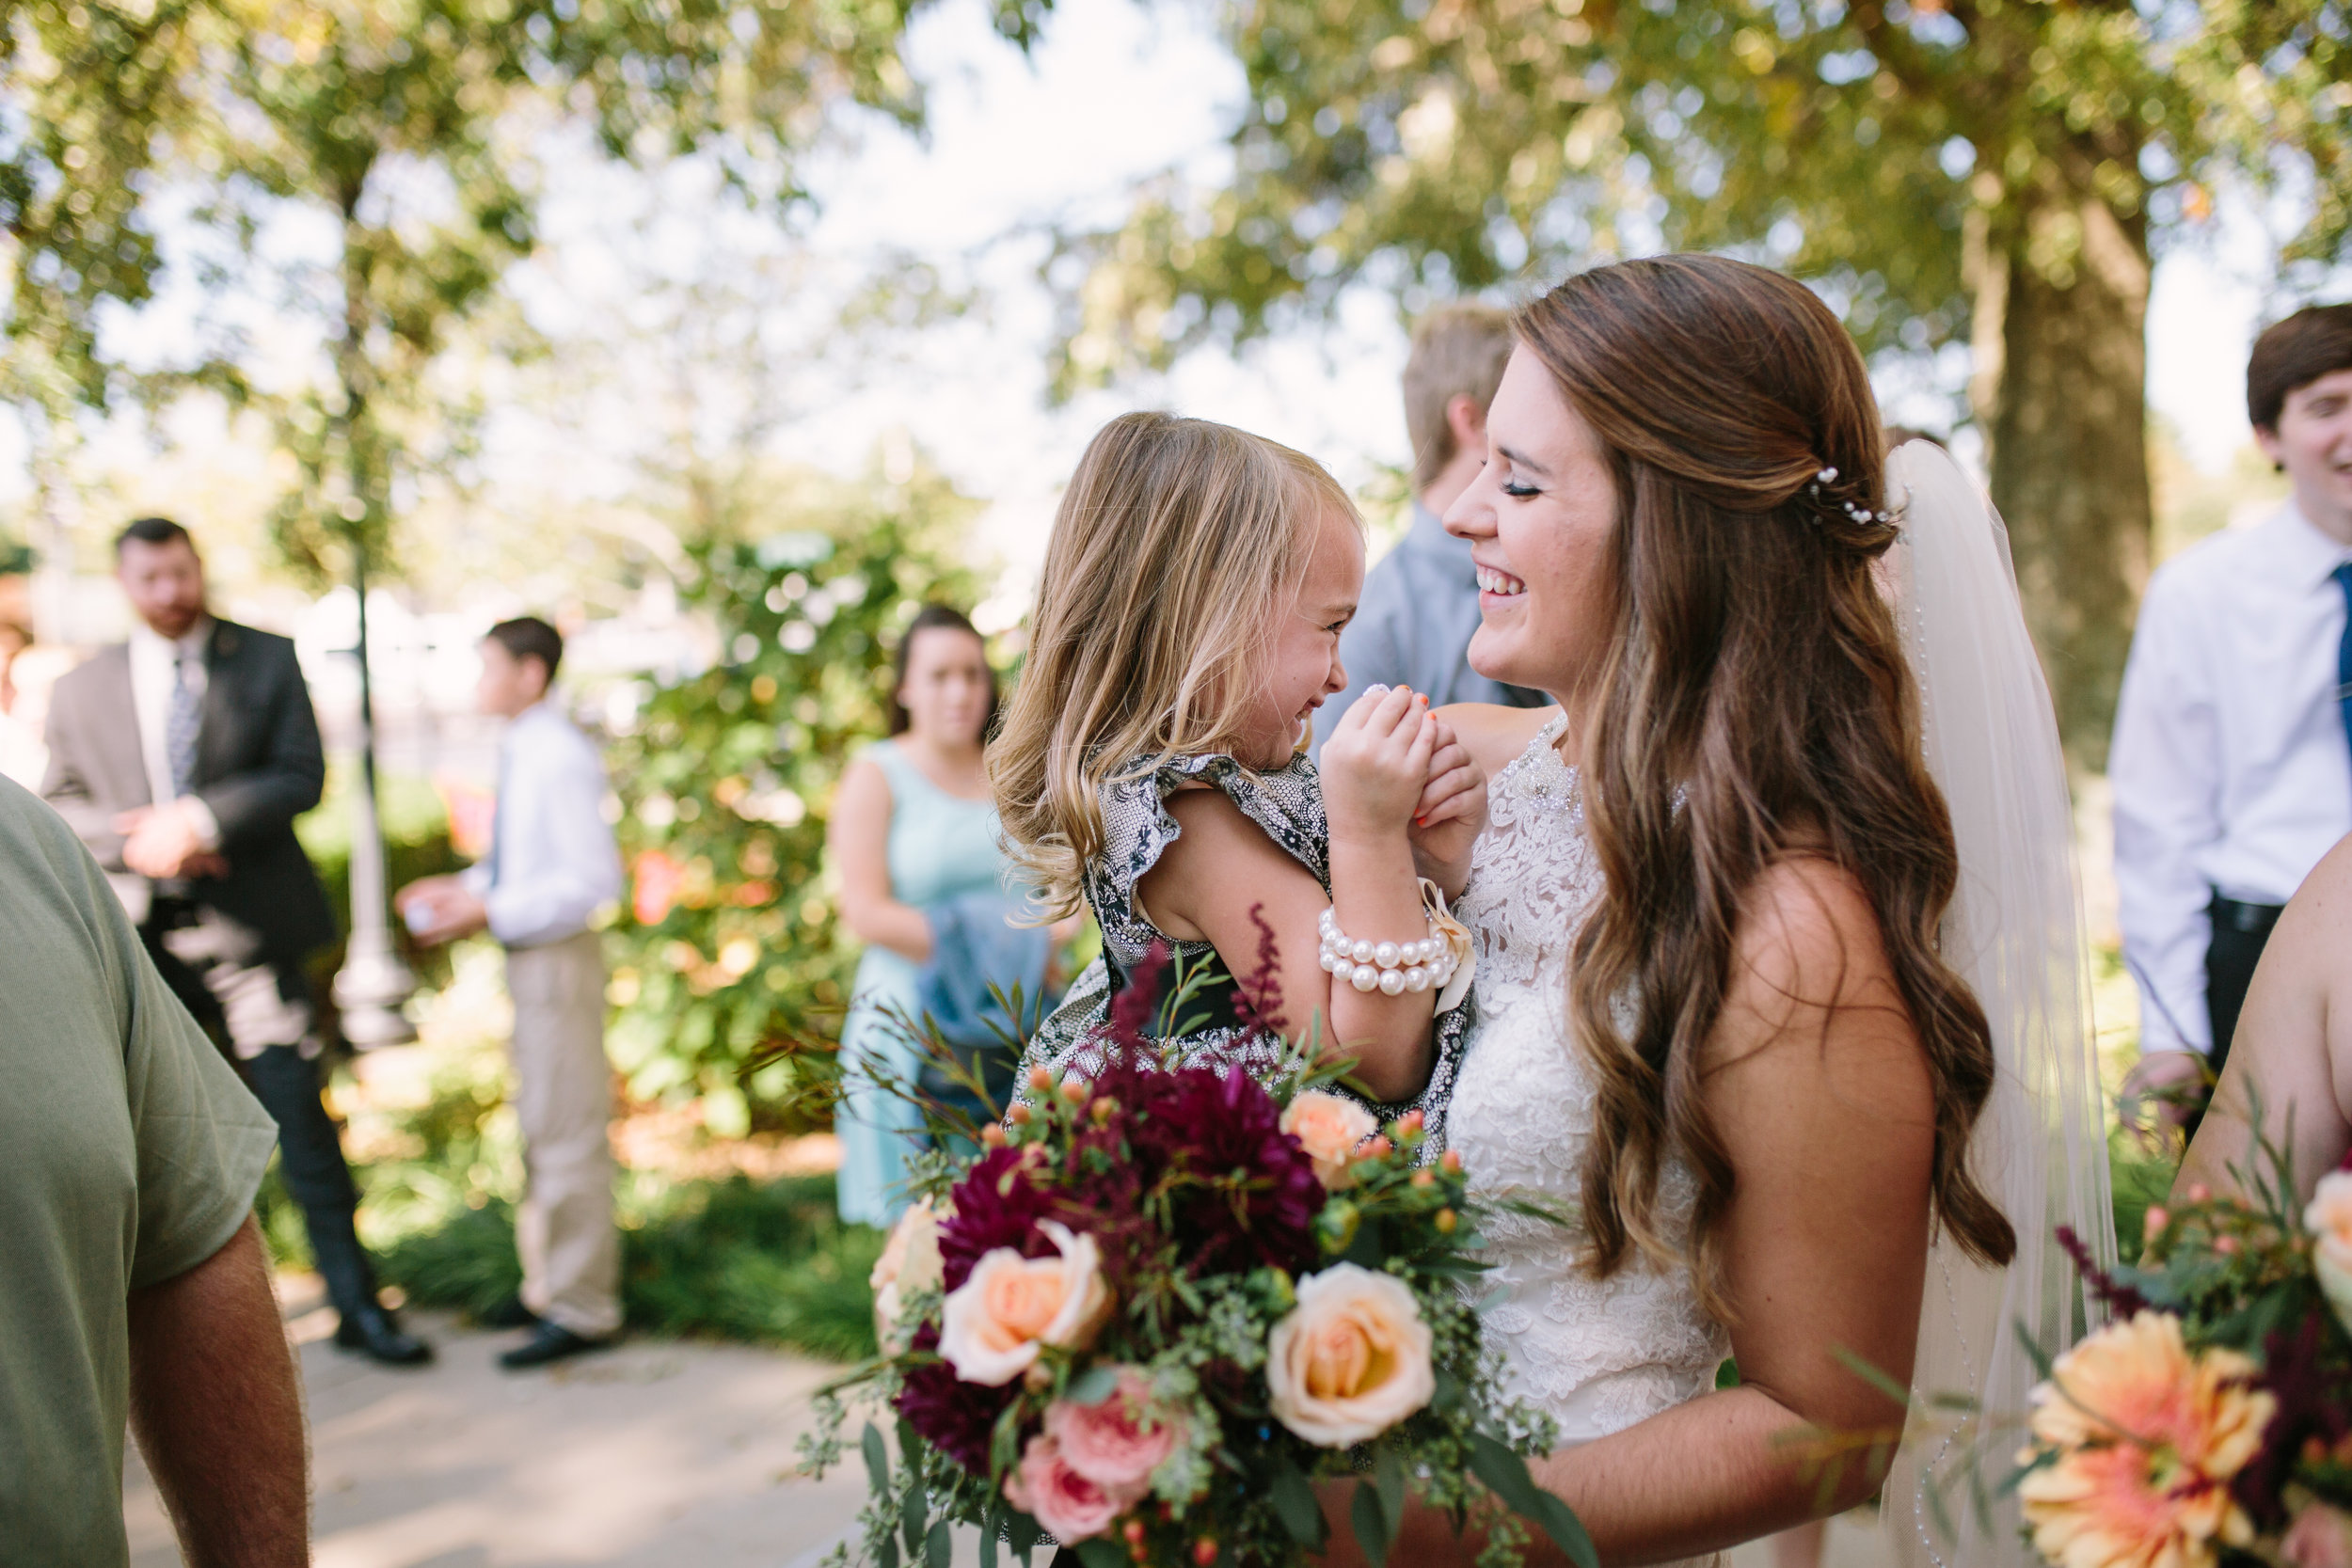 wedding.louisville.kentucky.wedding.photographer.nashville.LA.newyork_-28.jpg